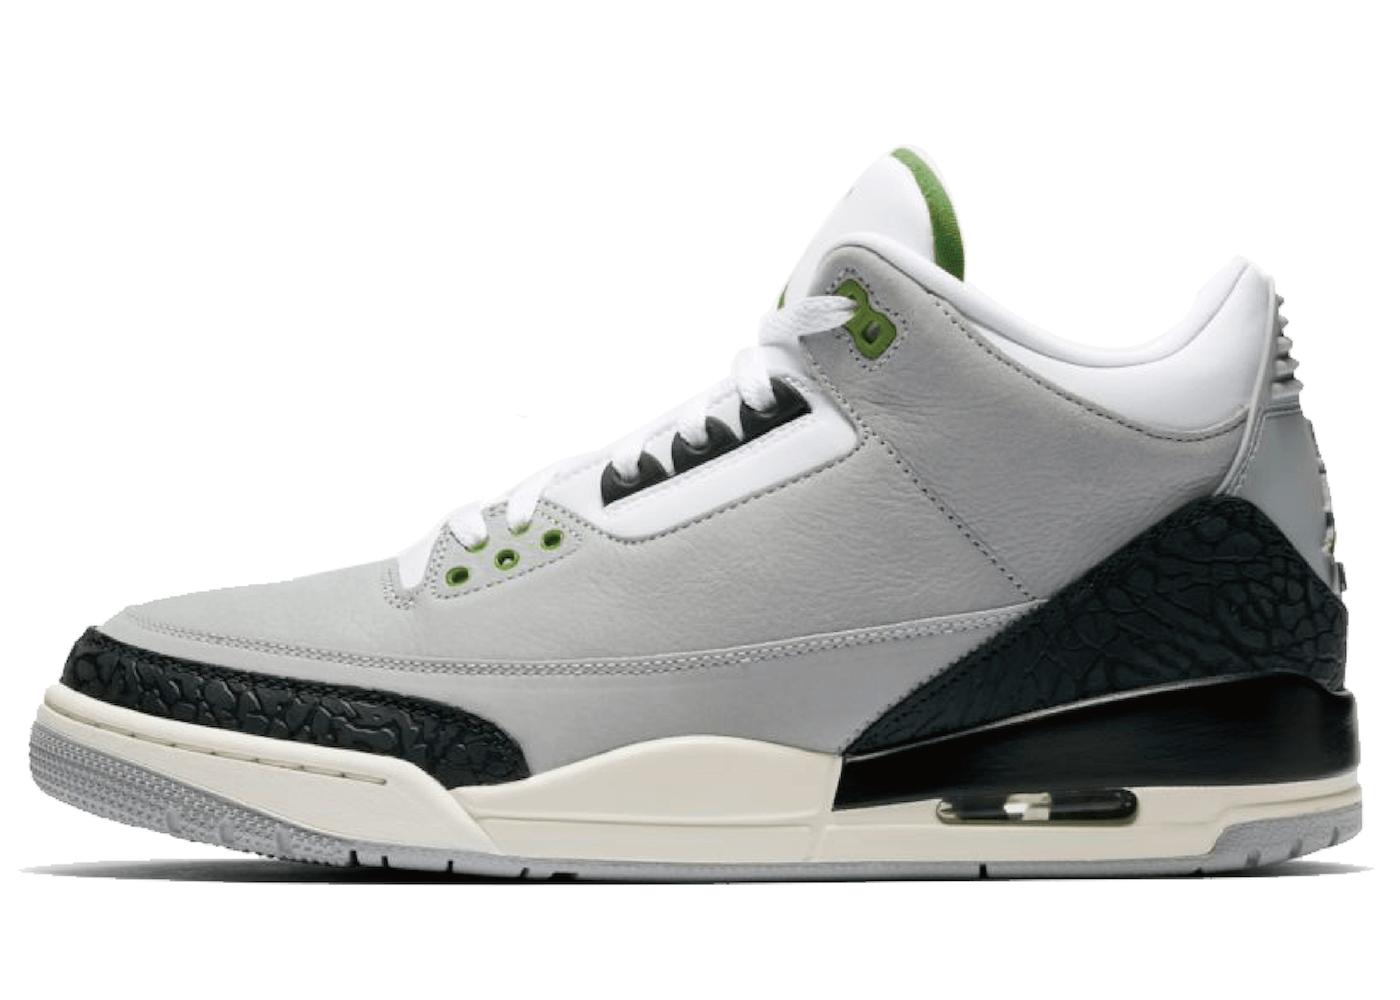 Nike Air Jordan 3 Retro Chlorophyllの写真